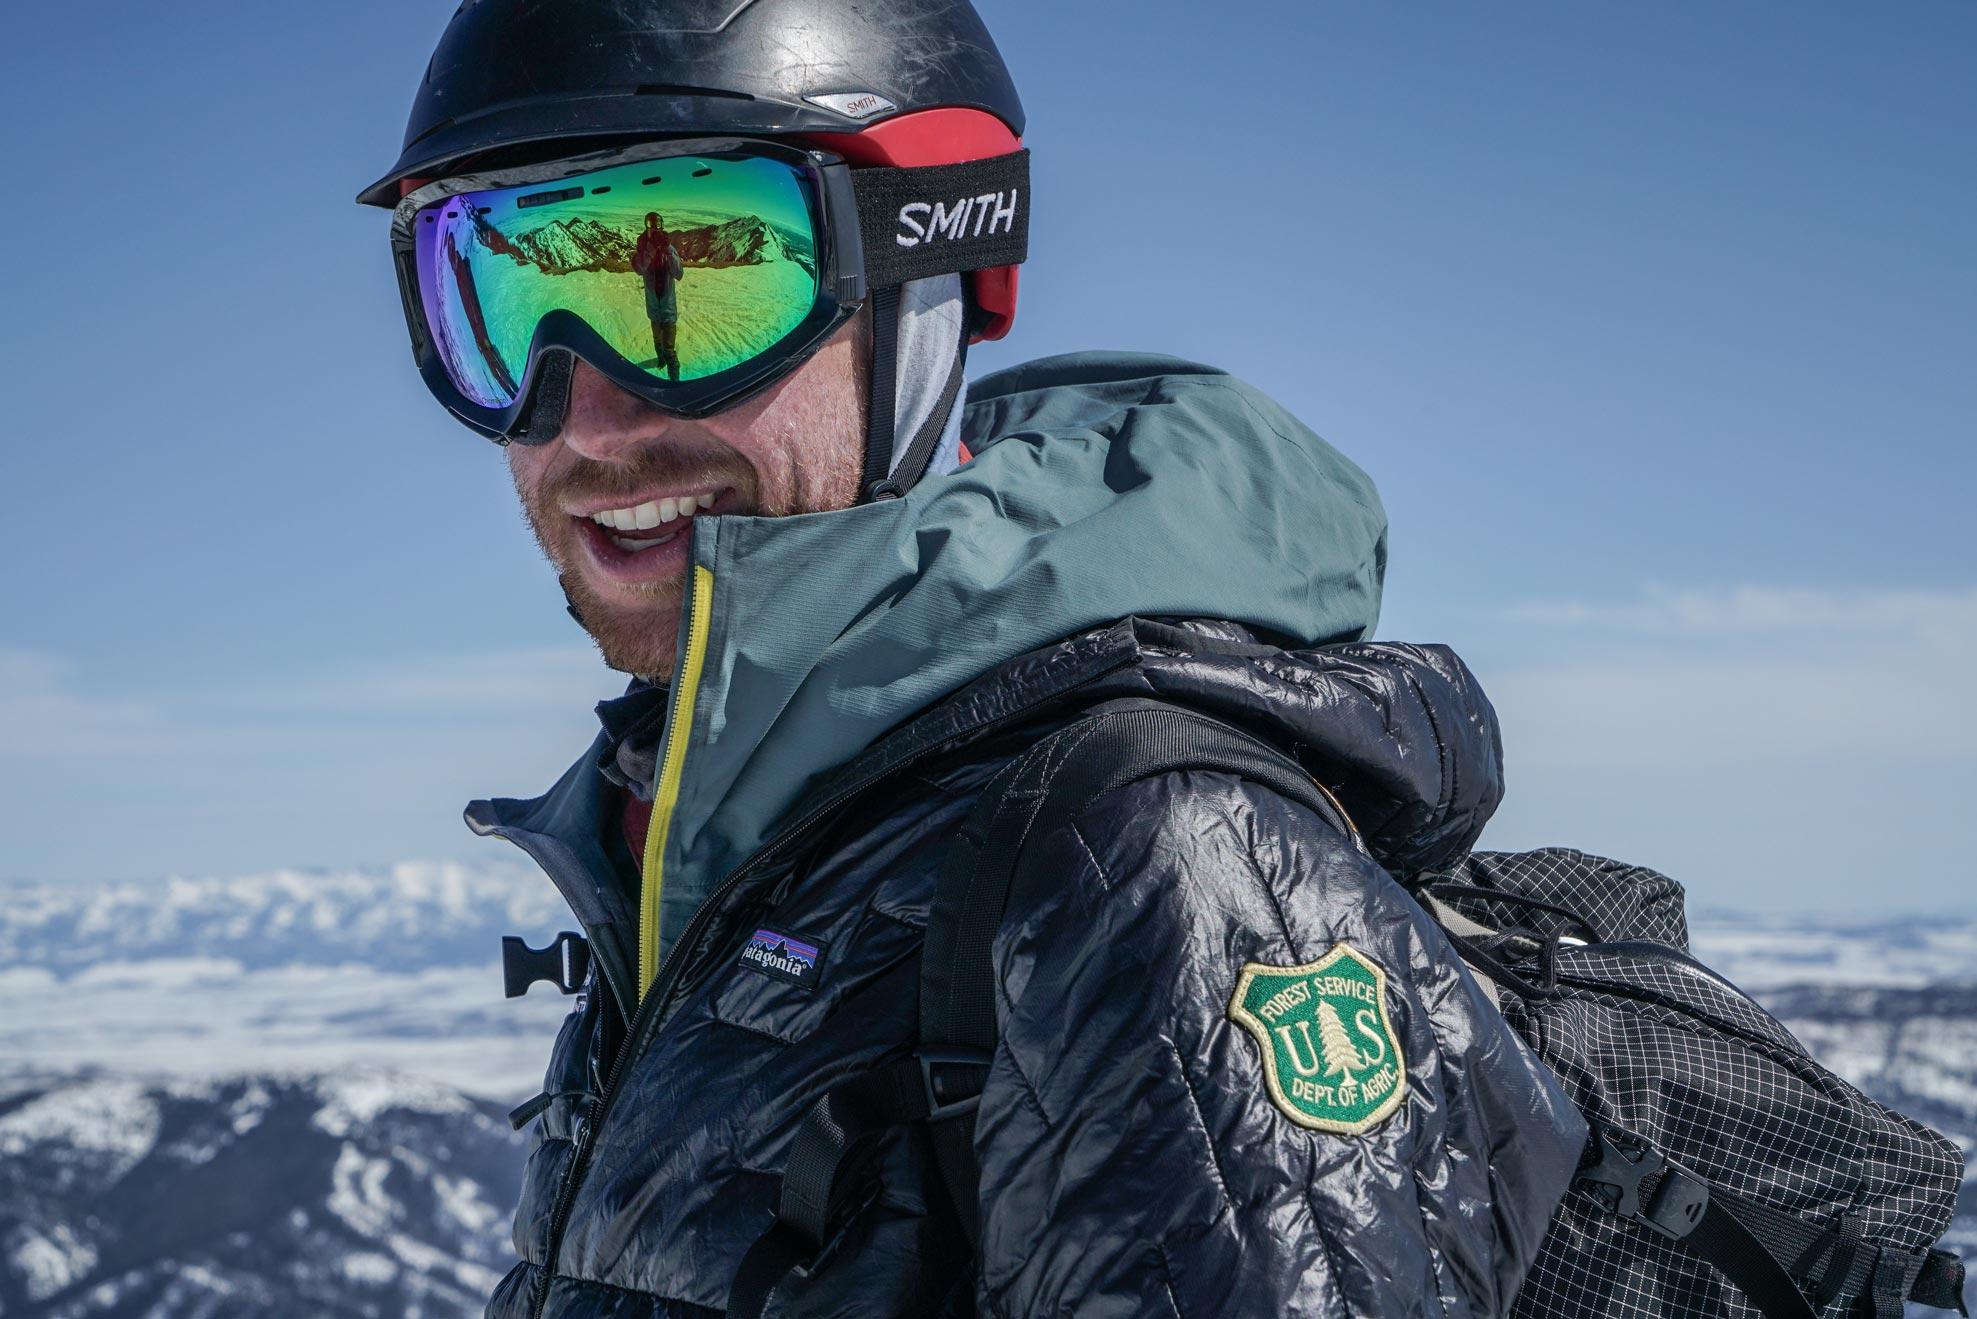 Alex Marienthal avalanche forecaster